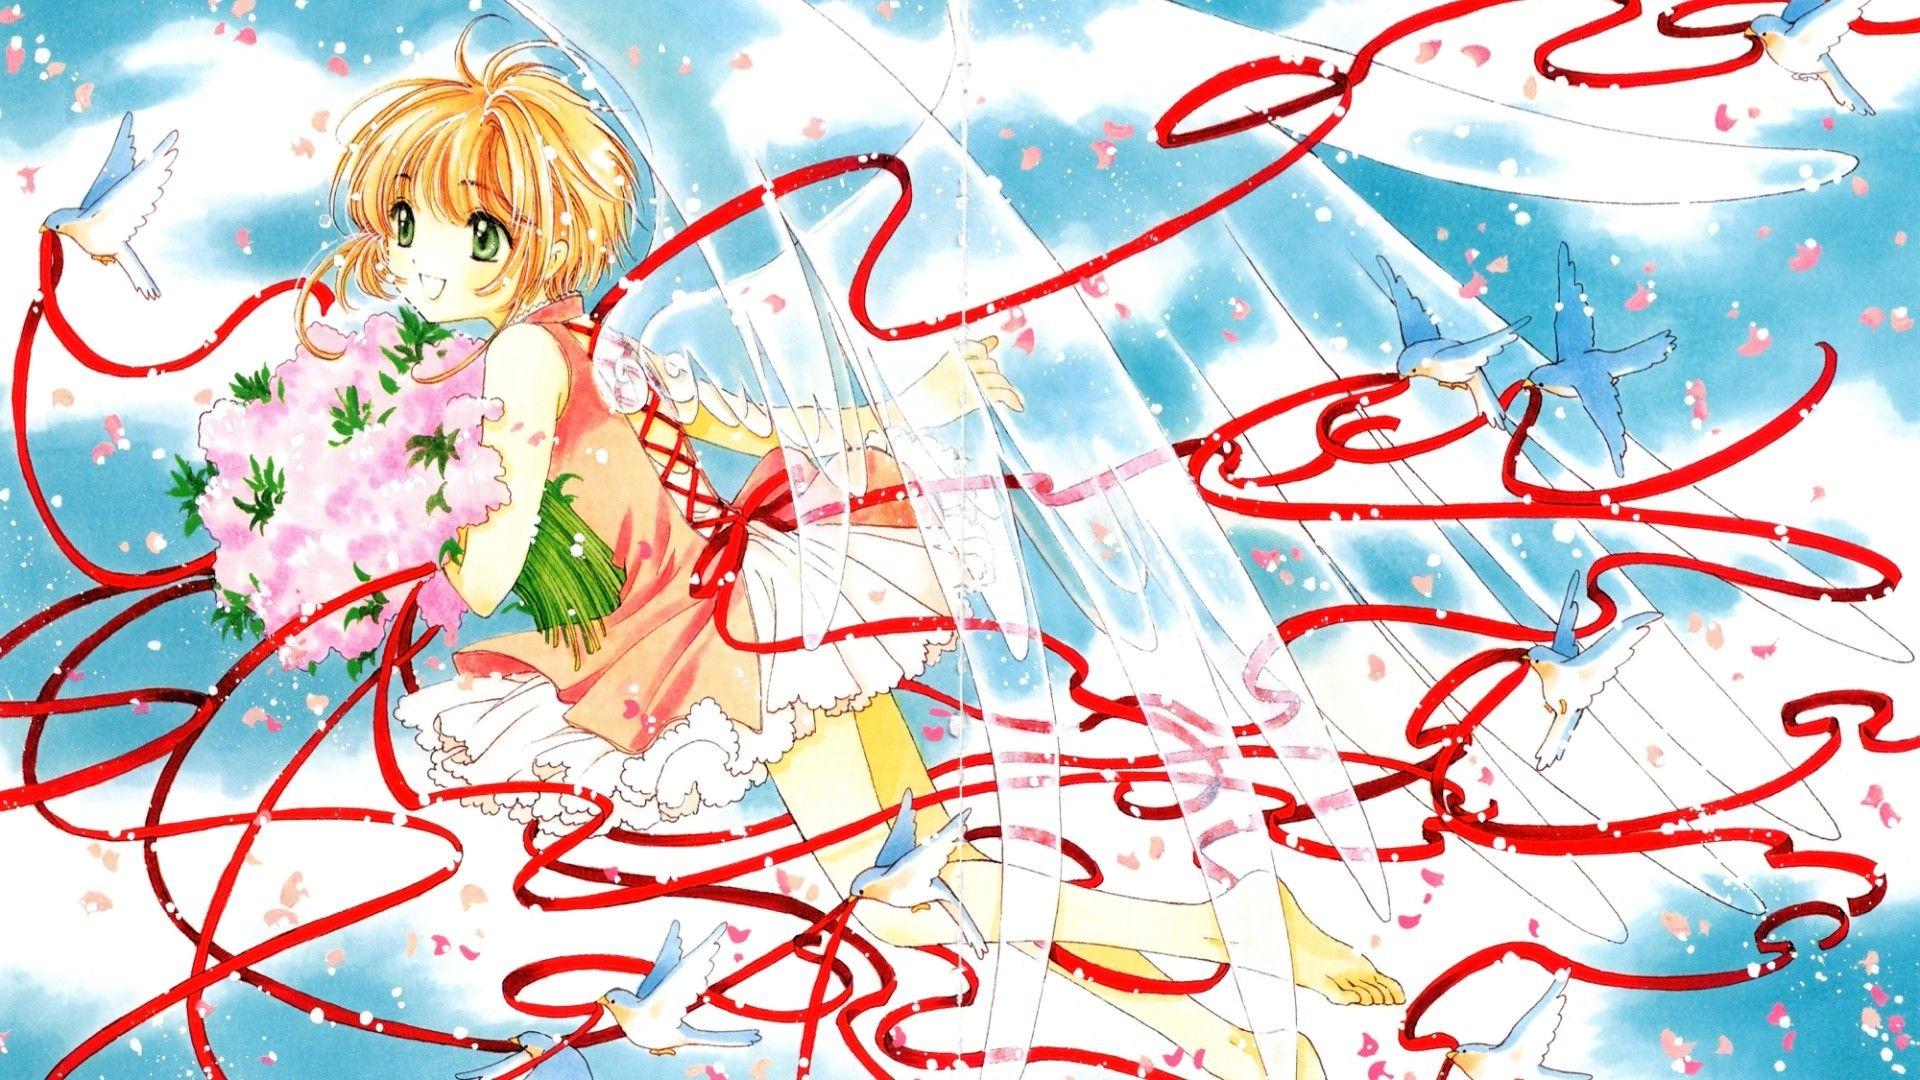 61 Cardcaptor Sakura Wallpapers On Wallpaperplay Sakura Art Sakura Cardcaptor